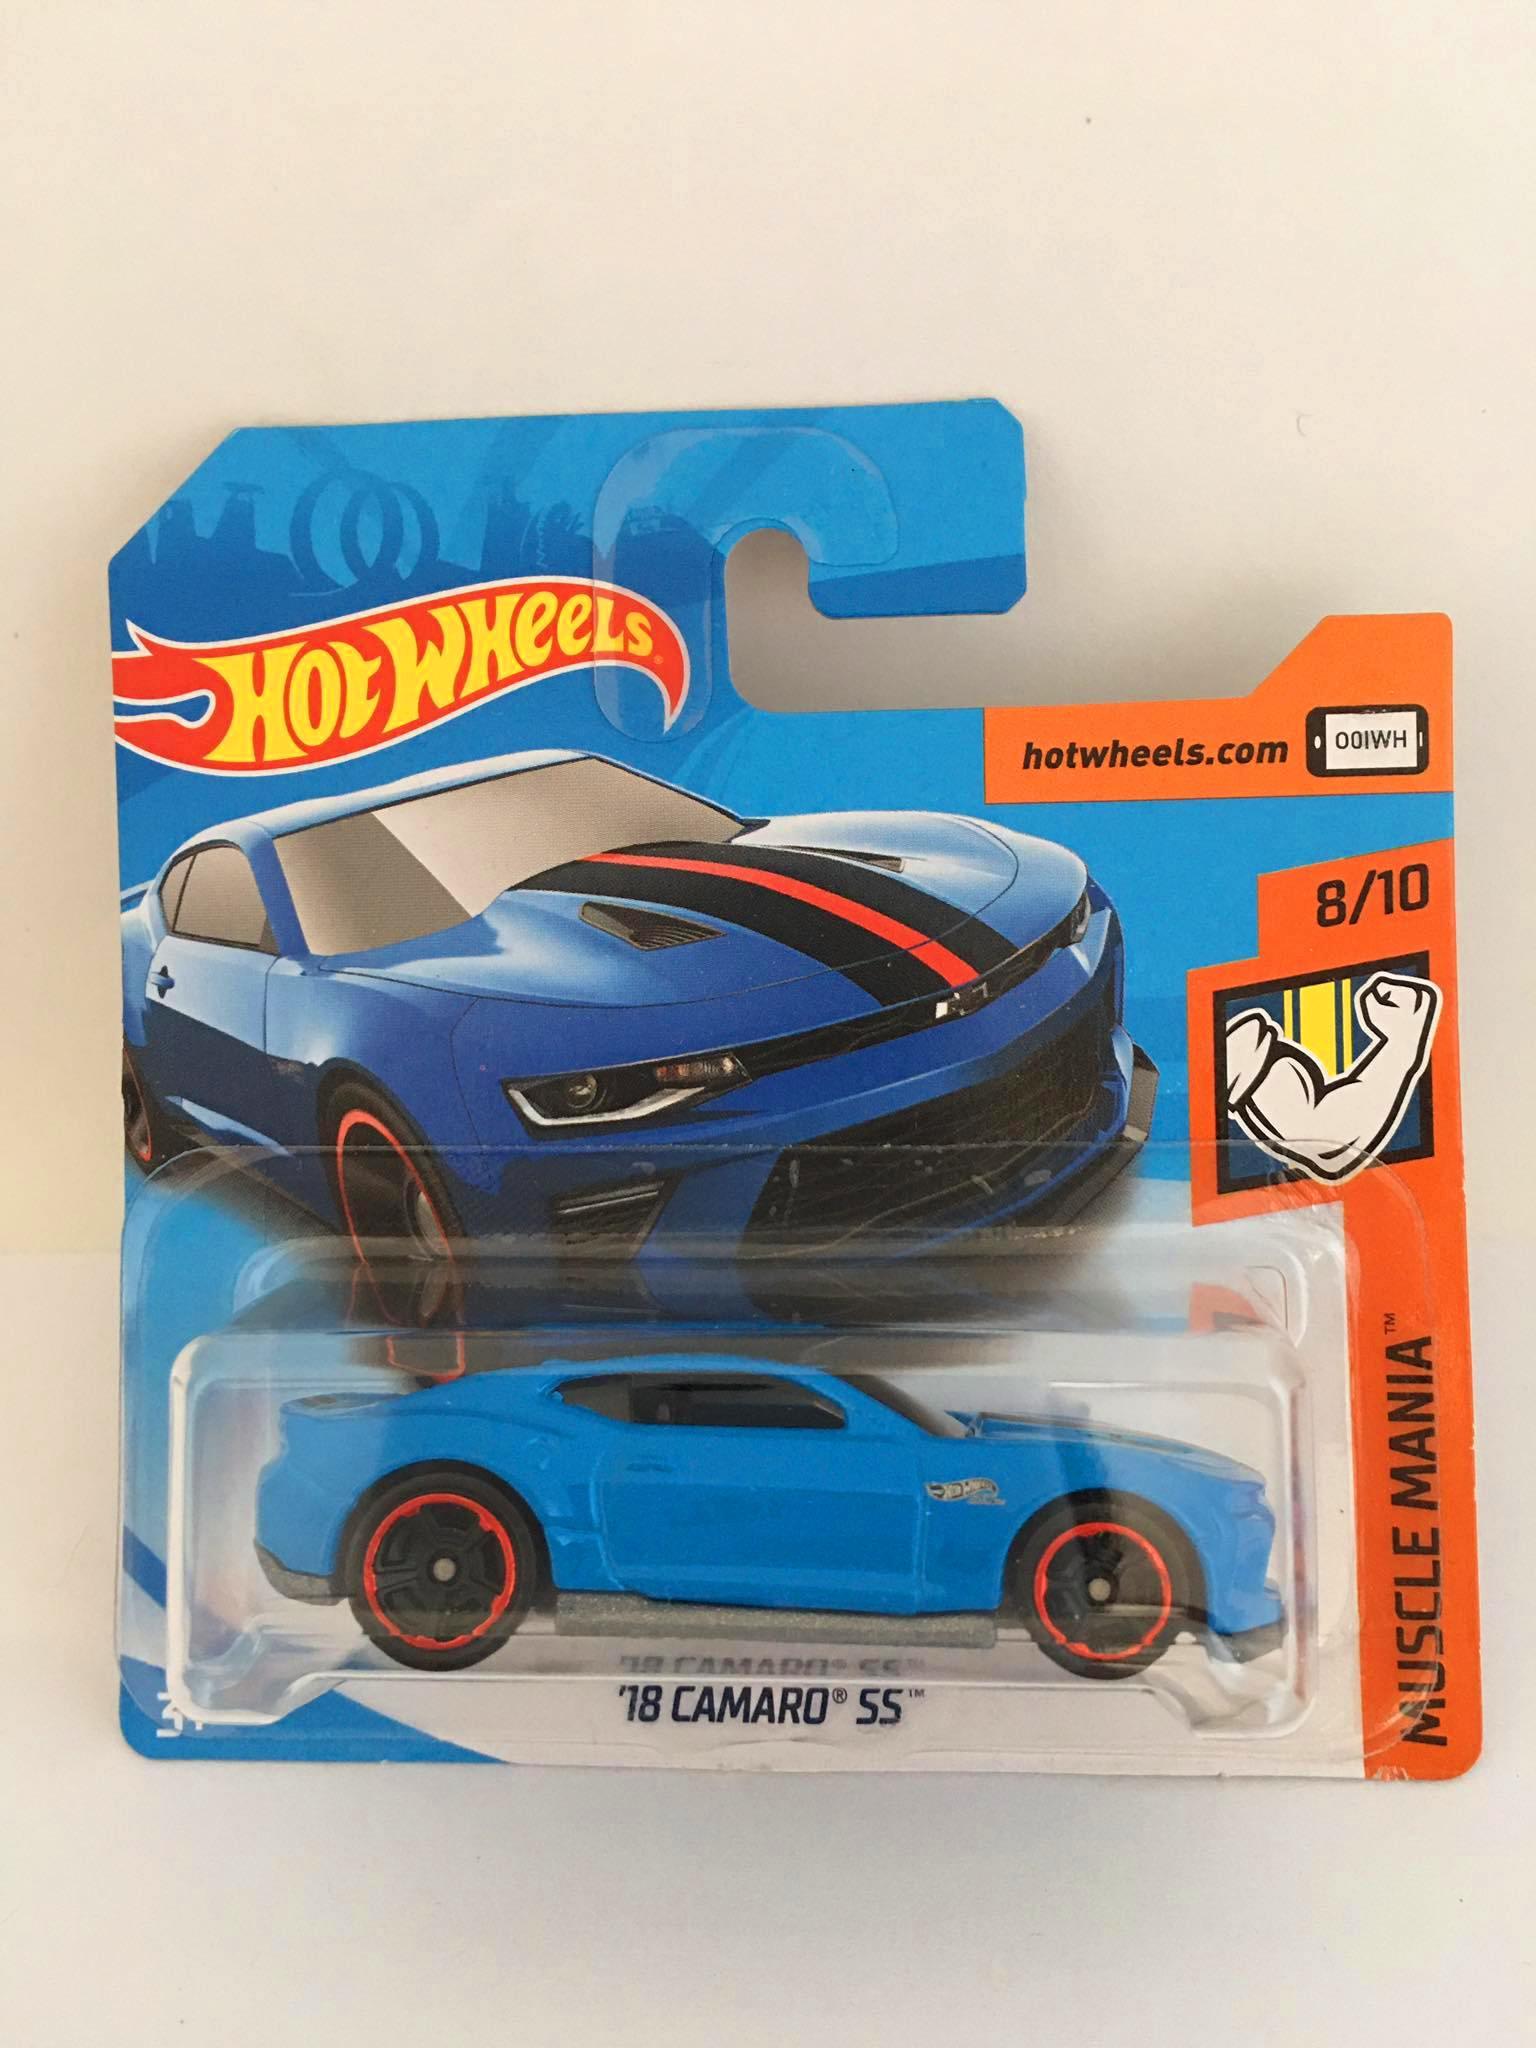 Hot Wheels - 18 Camaro SS Azul - Mainline 2018